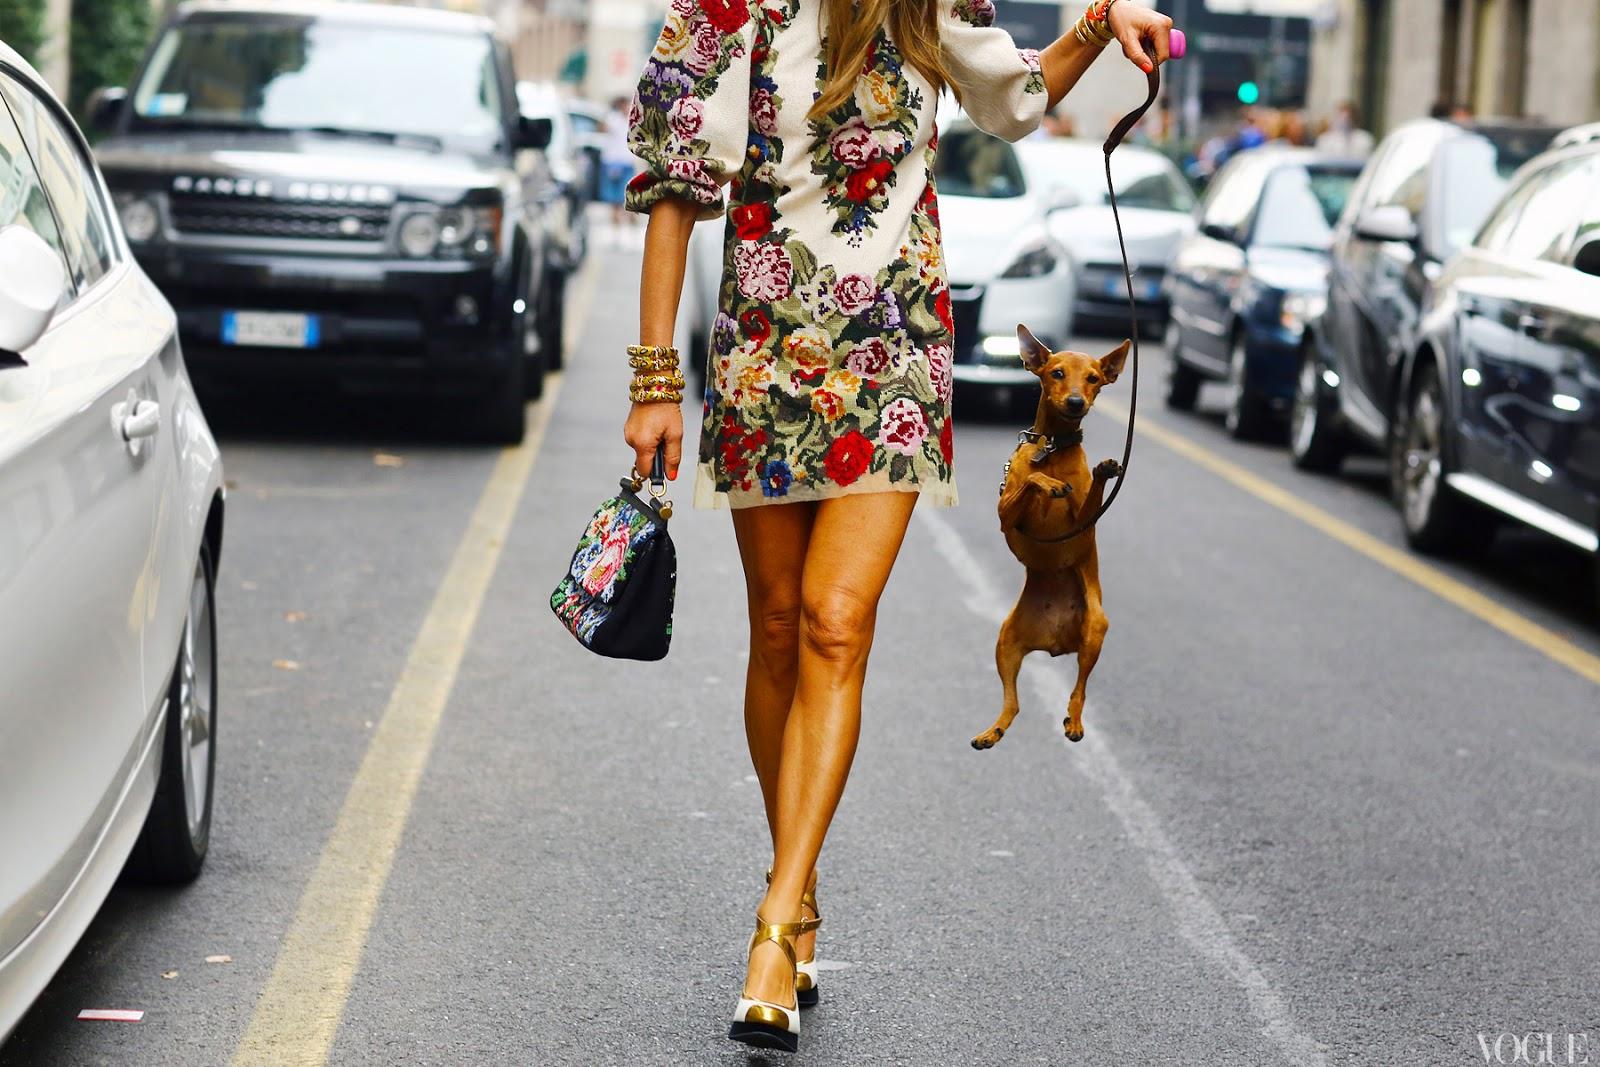 http://3.bp.blogspot.com/-imLQU1XTPh0/UPALRw2NSMI/AAAAAAAASTk/S8b4bZasqN8/s1600/la-modella-mafia-Anna-Dello-Russo-fashion-editor-street-style-Spring-2013-Dolce-Gabbana-dress-and-bag-vogue.jpg